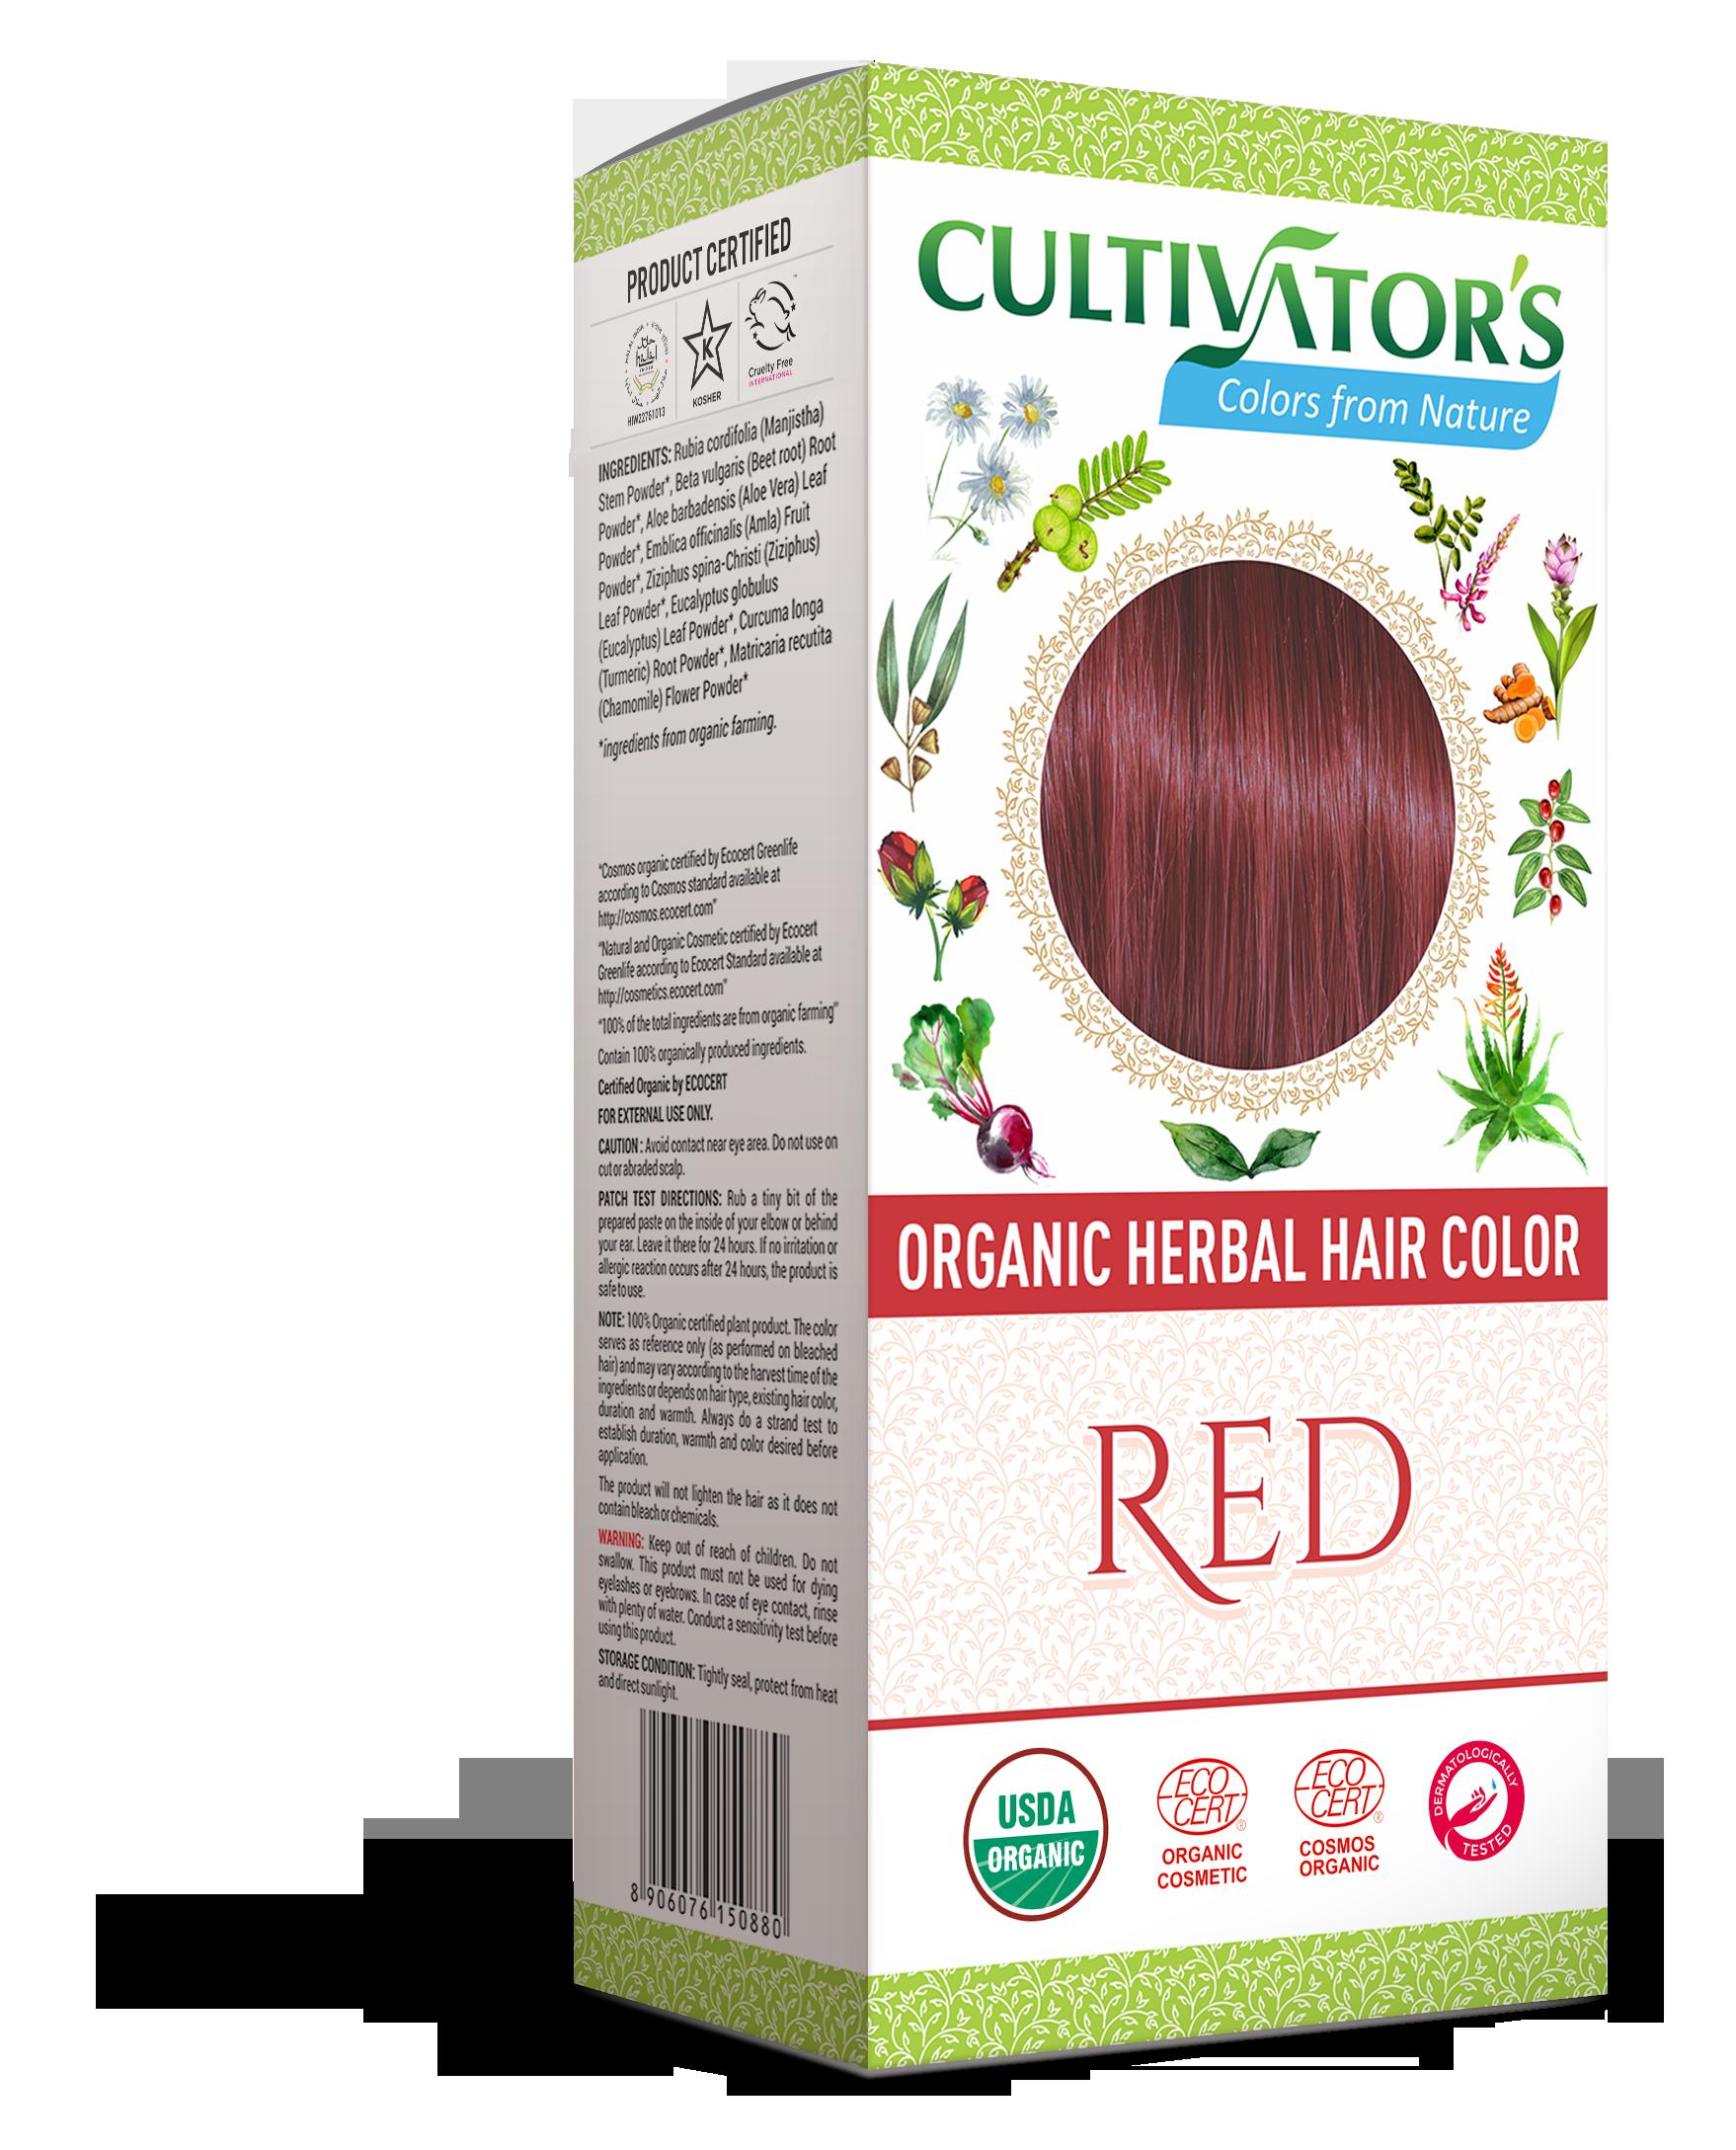 6a51d8524 Red – Organic herbal hair color Manjistha, Beet root, Henna, Aloe ,  Ziziphus, Amla,Eucalyptus, Turmeric,Chamomile Certified Organic NPOP, USDA  NOP, EU, ...